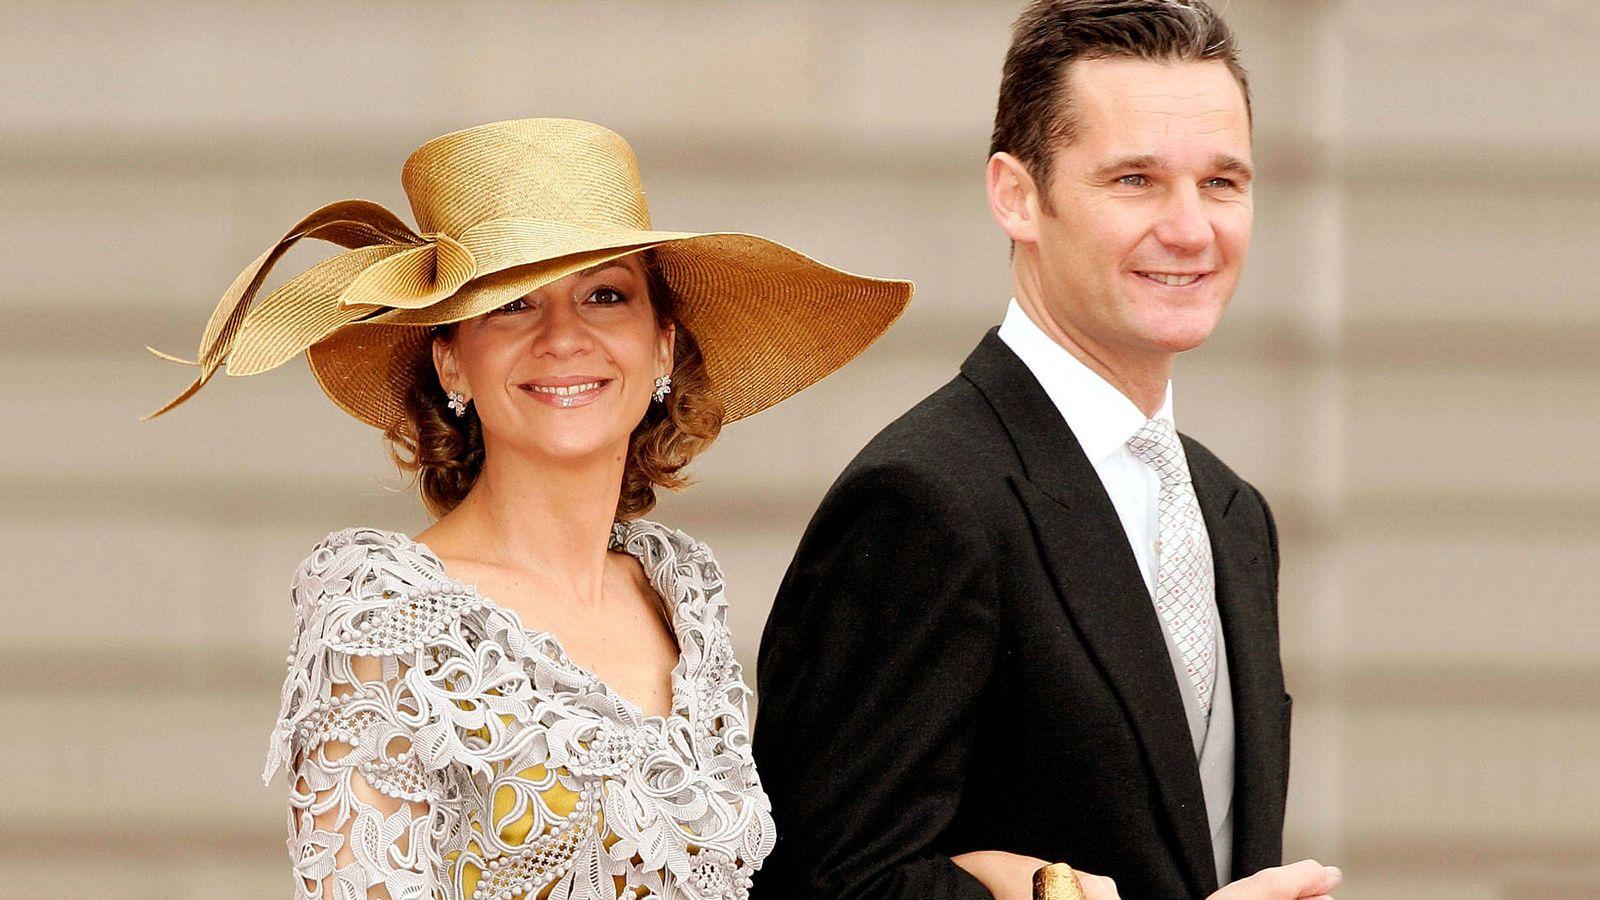 Foto:  La infanta Cristina e Iñaki Urdangarin, en la boda. (Getty)